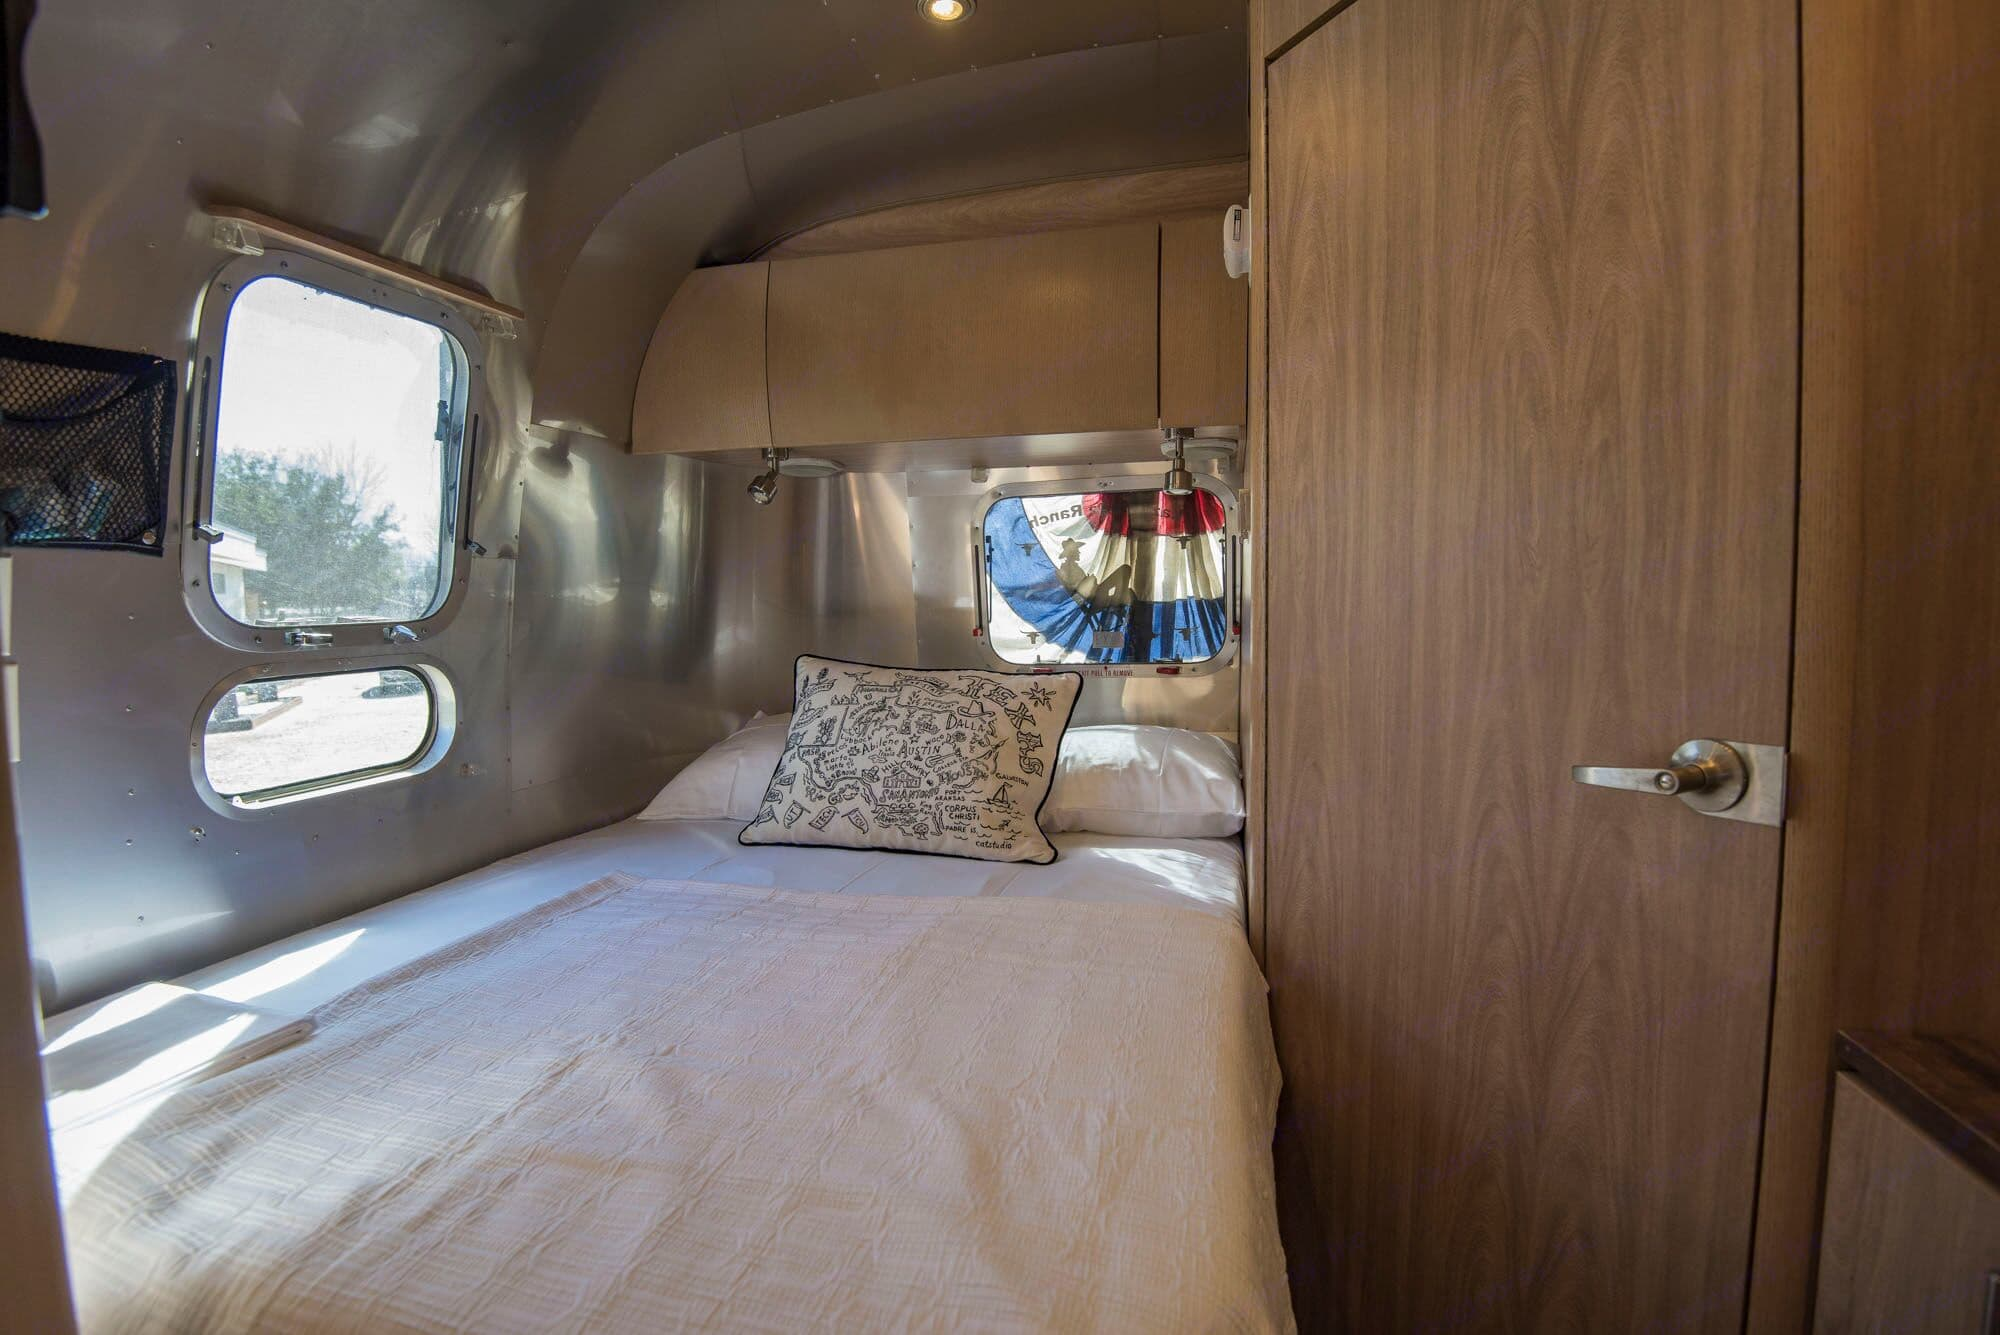 Luxury Bedding and memory foam mattress,. Airstream Safari 2006